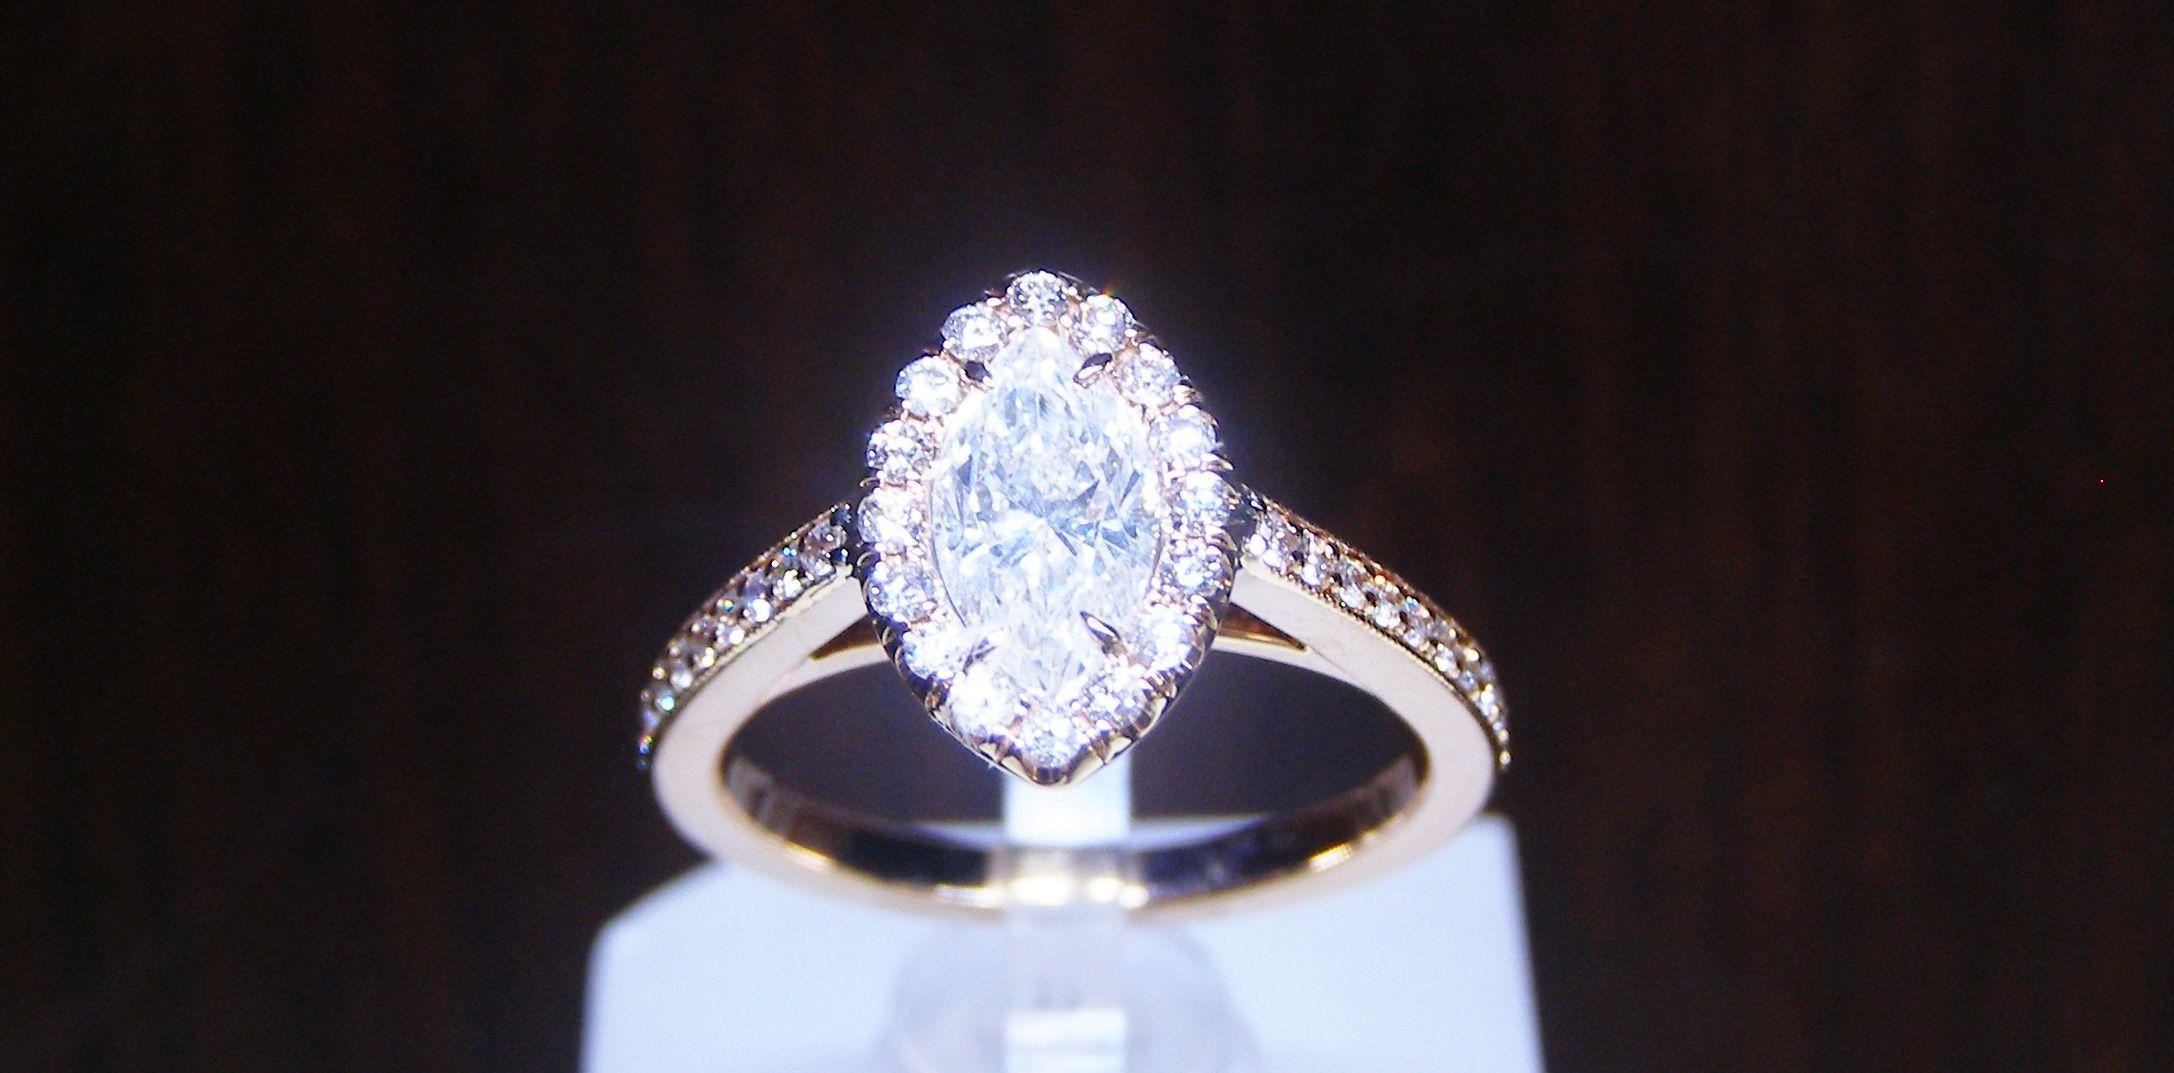 Marquise cut diamond engagement ring. Such a unique look! www.masicadiamonds.com